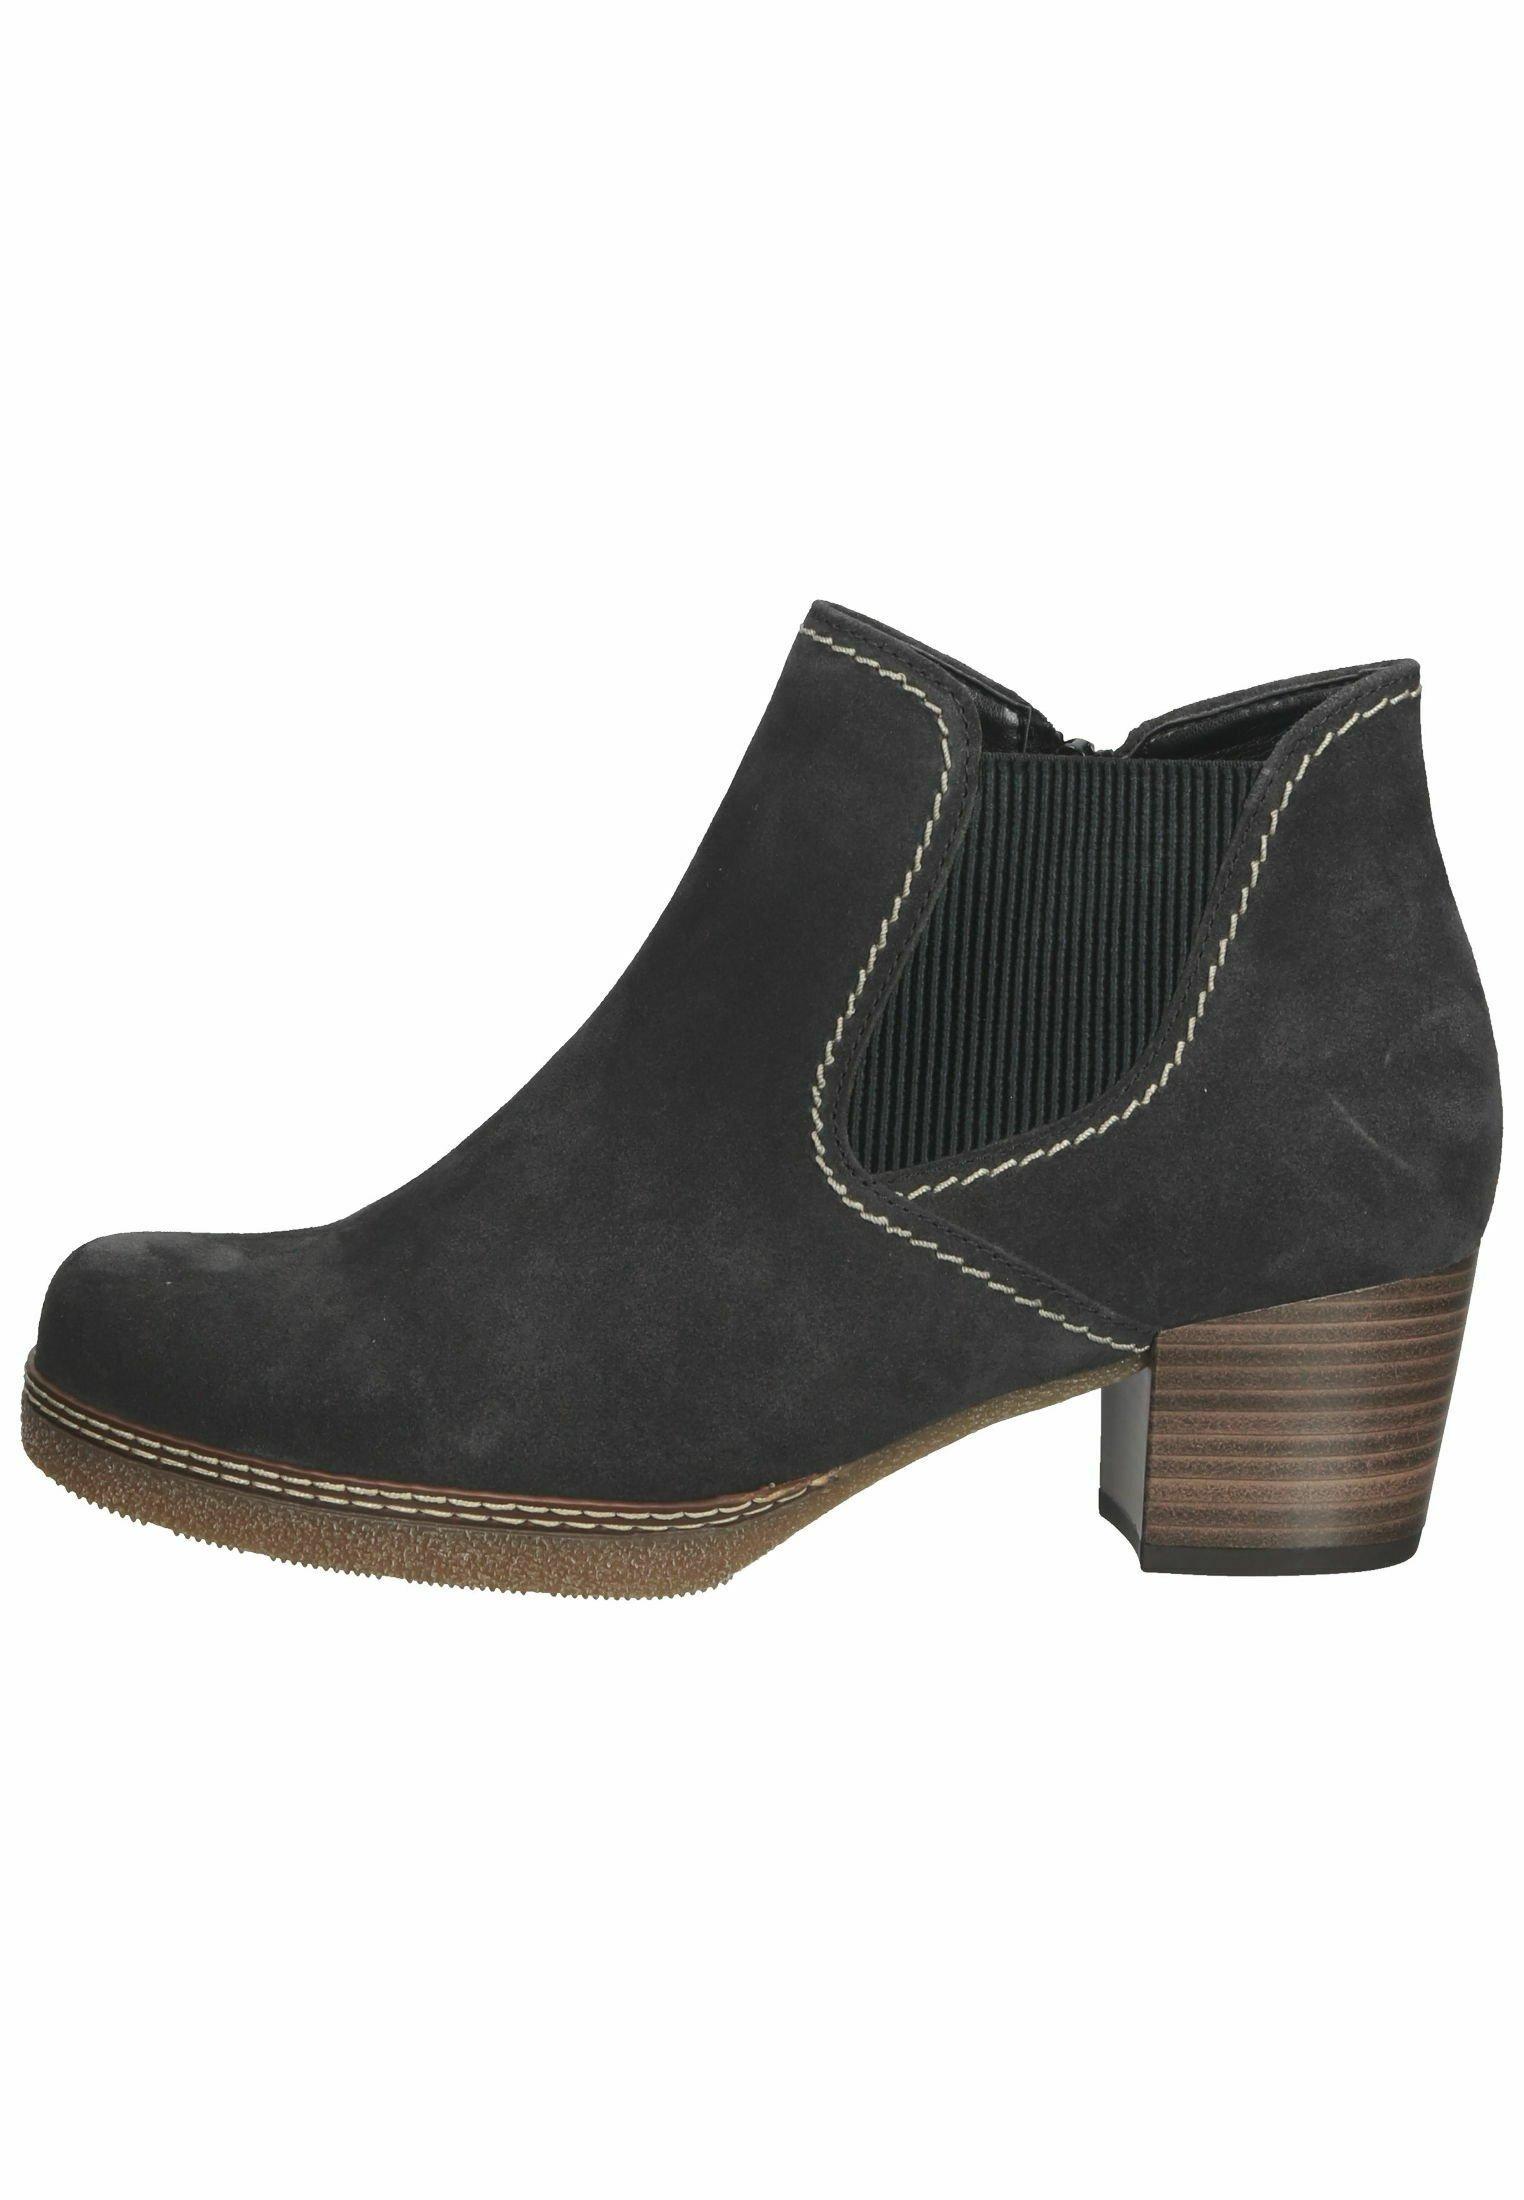 Damen Ankle Boot - dark/grey